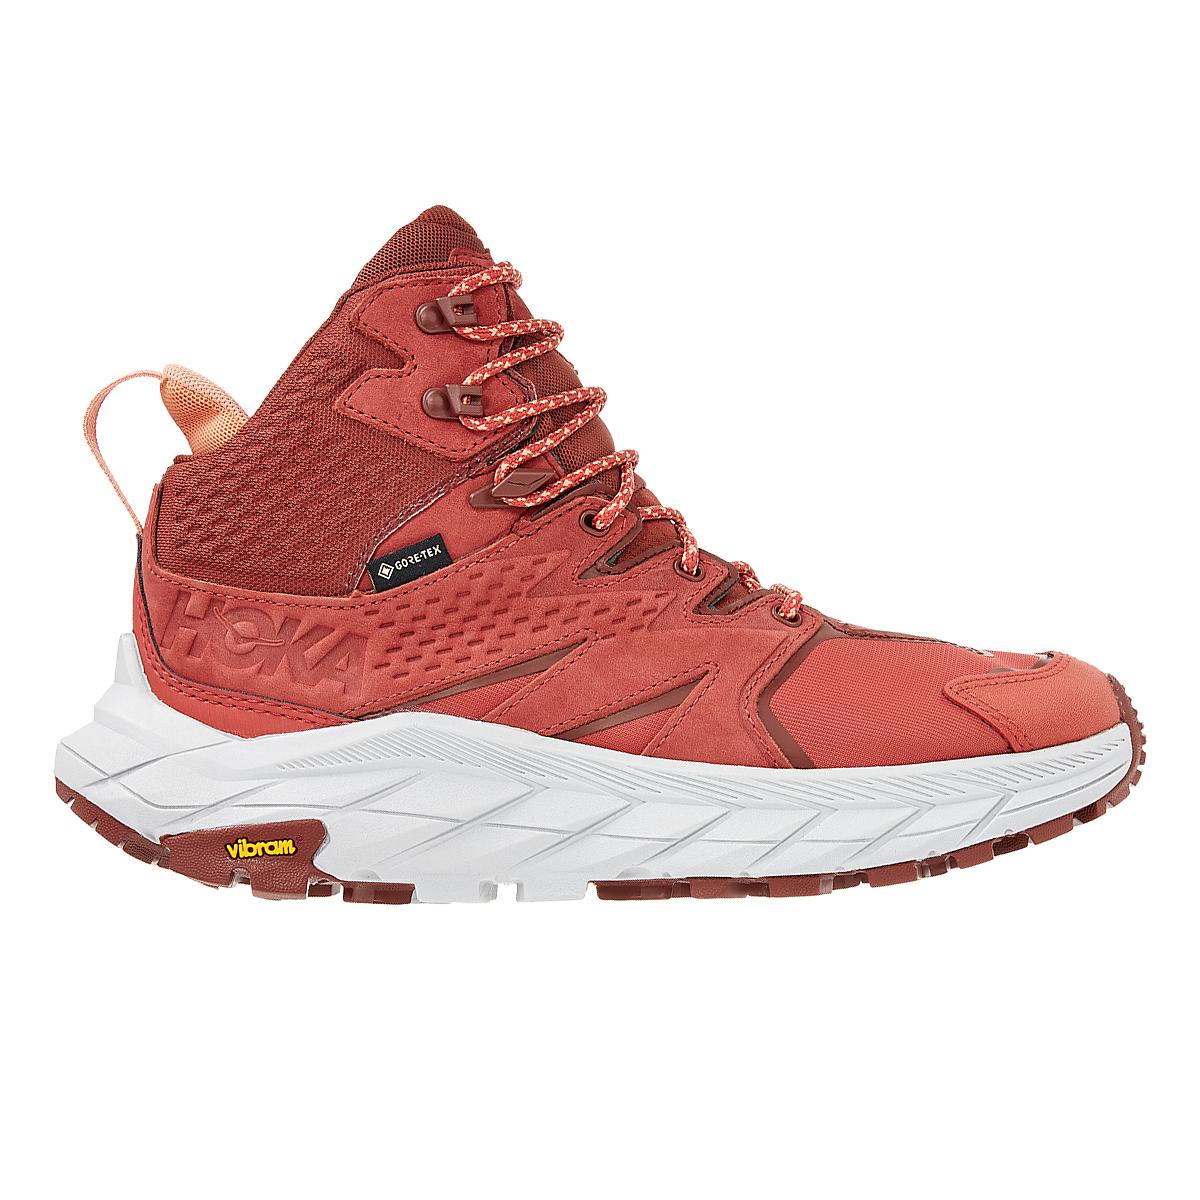 Women's Hoka One One Anacapa Mid Gore-Tex Trail Running Shoe - Color: Hot Sauce/Cherry Mahogany - Size: 5 - Width: Regular, Hot Sauce/Cherry Mahogany, large, image 1